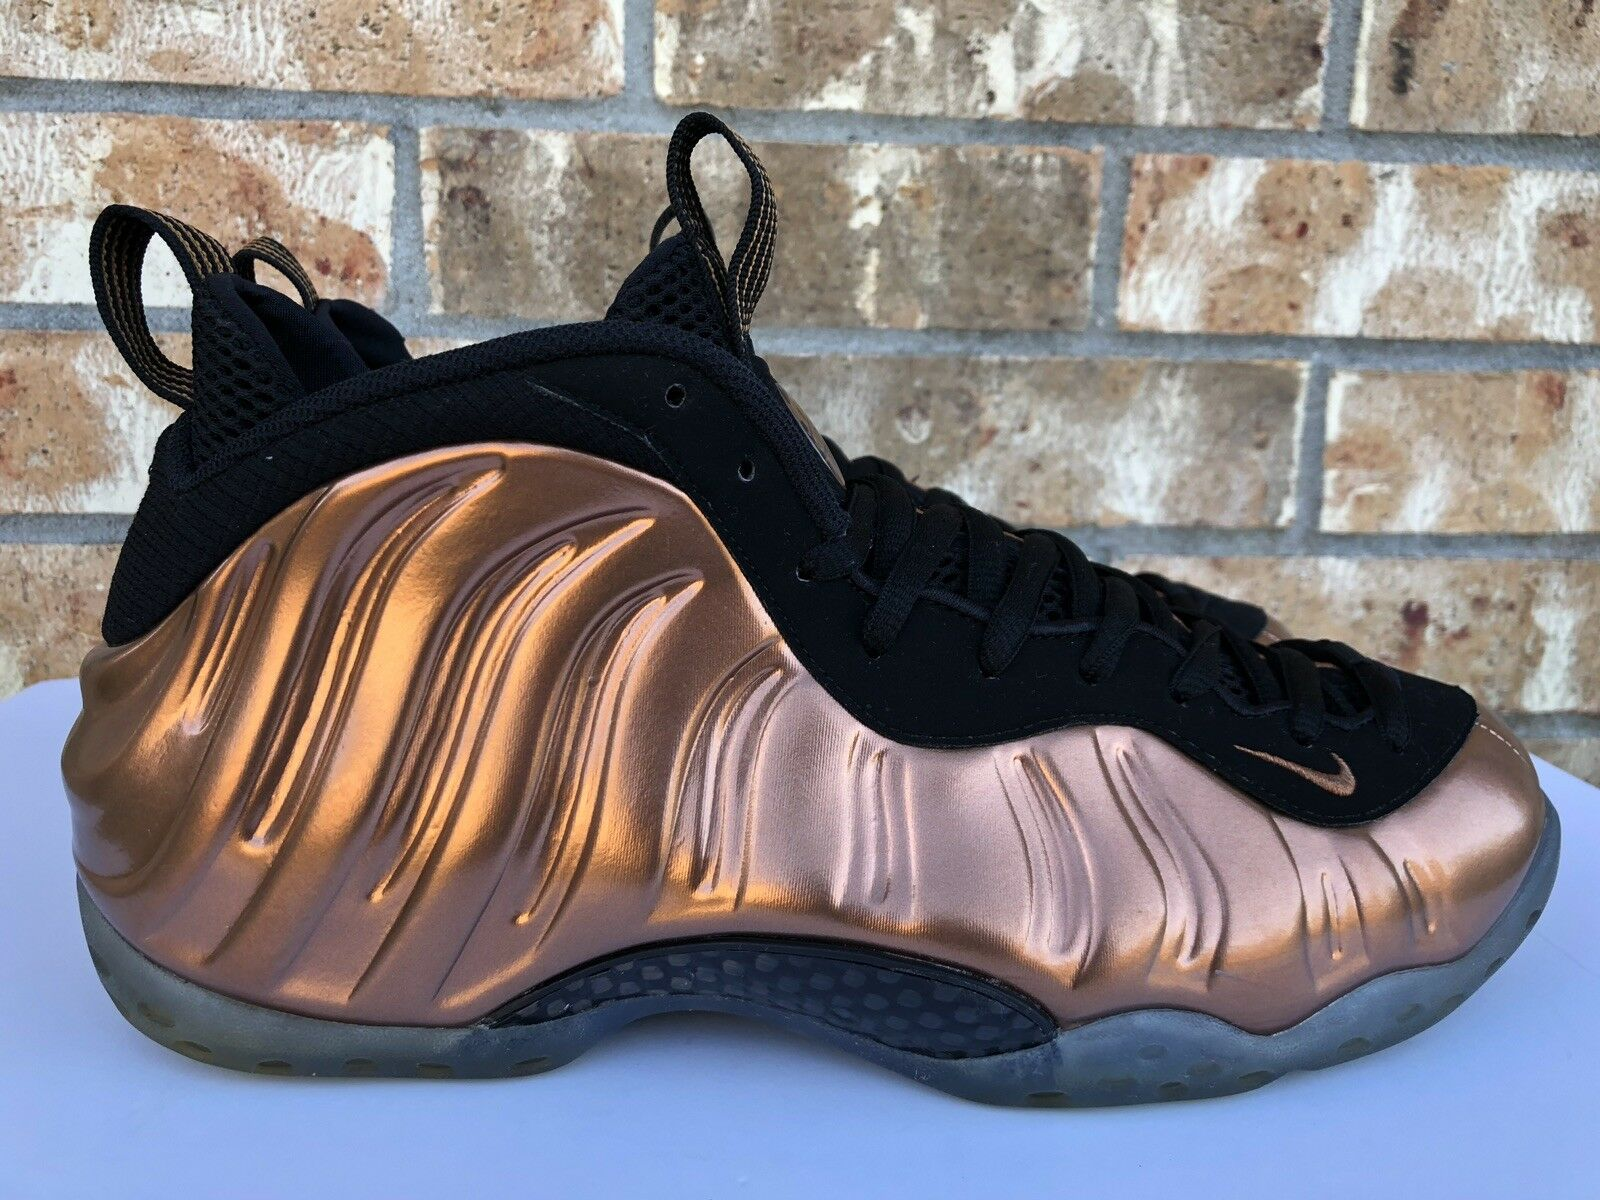 Men's Nike Air Foamposite One Metallic Copper gold OG 2017 Size 10.5 314996-007